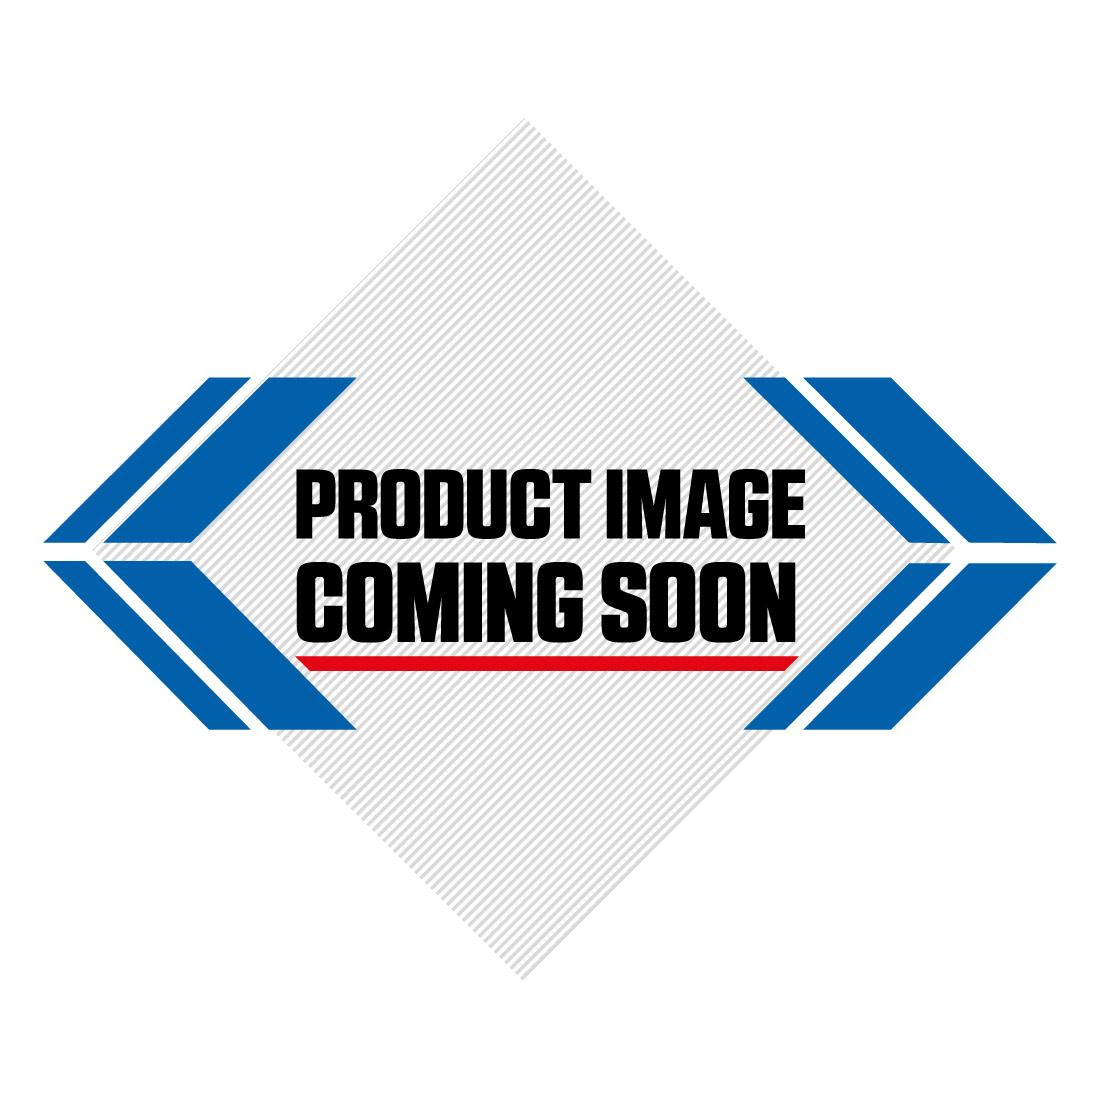 Silkolene Comp 4 10w-40 XP Ester Based Semi Synthetic Bike Engine Oil - 4 Cube Image-4